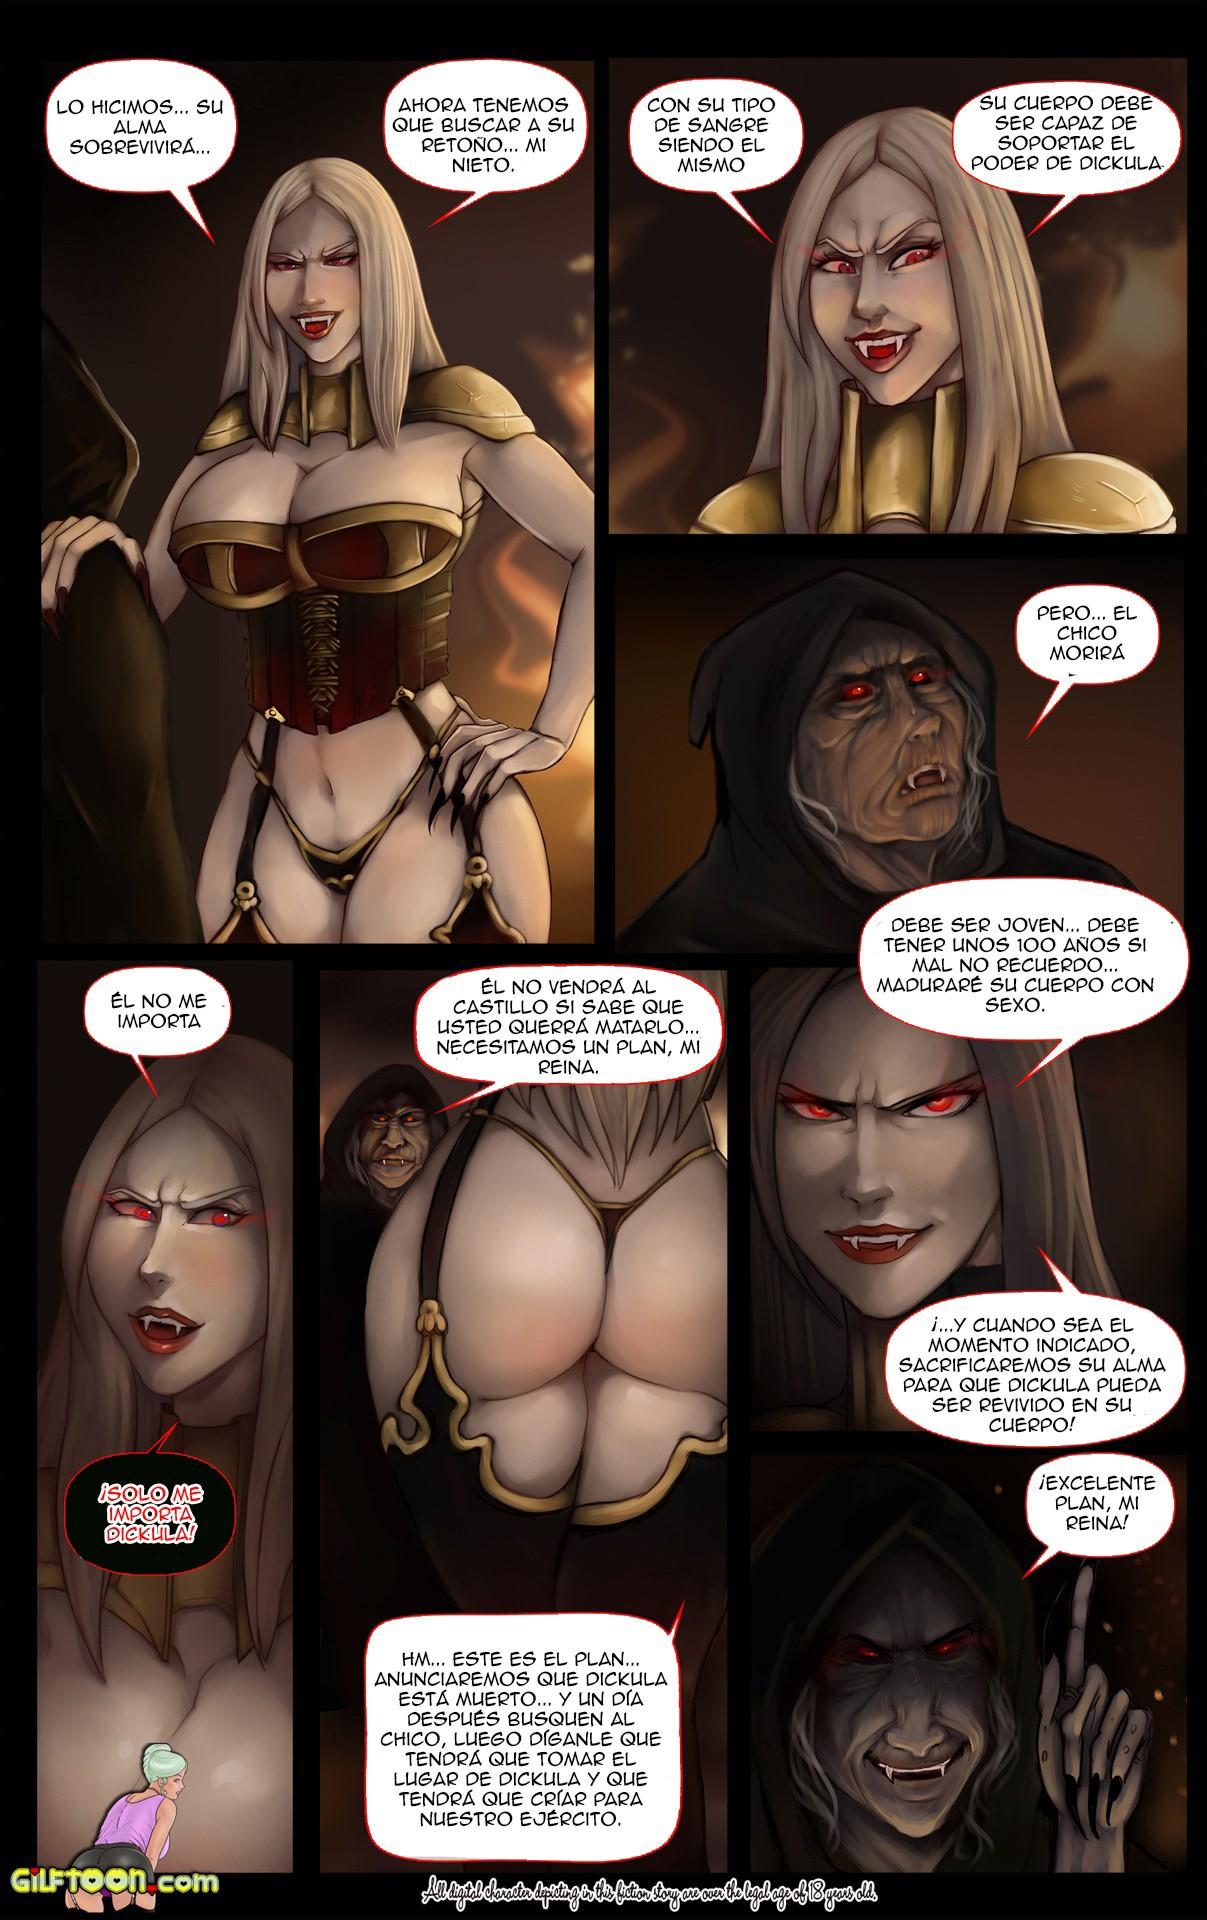 Vampires-Grandson-Gilftoon-04.jpg comic porno